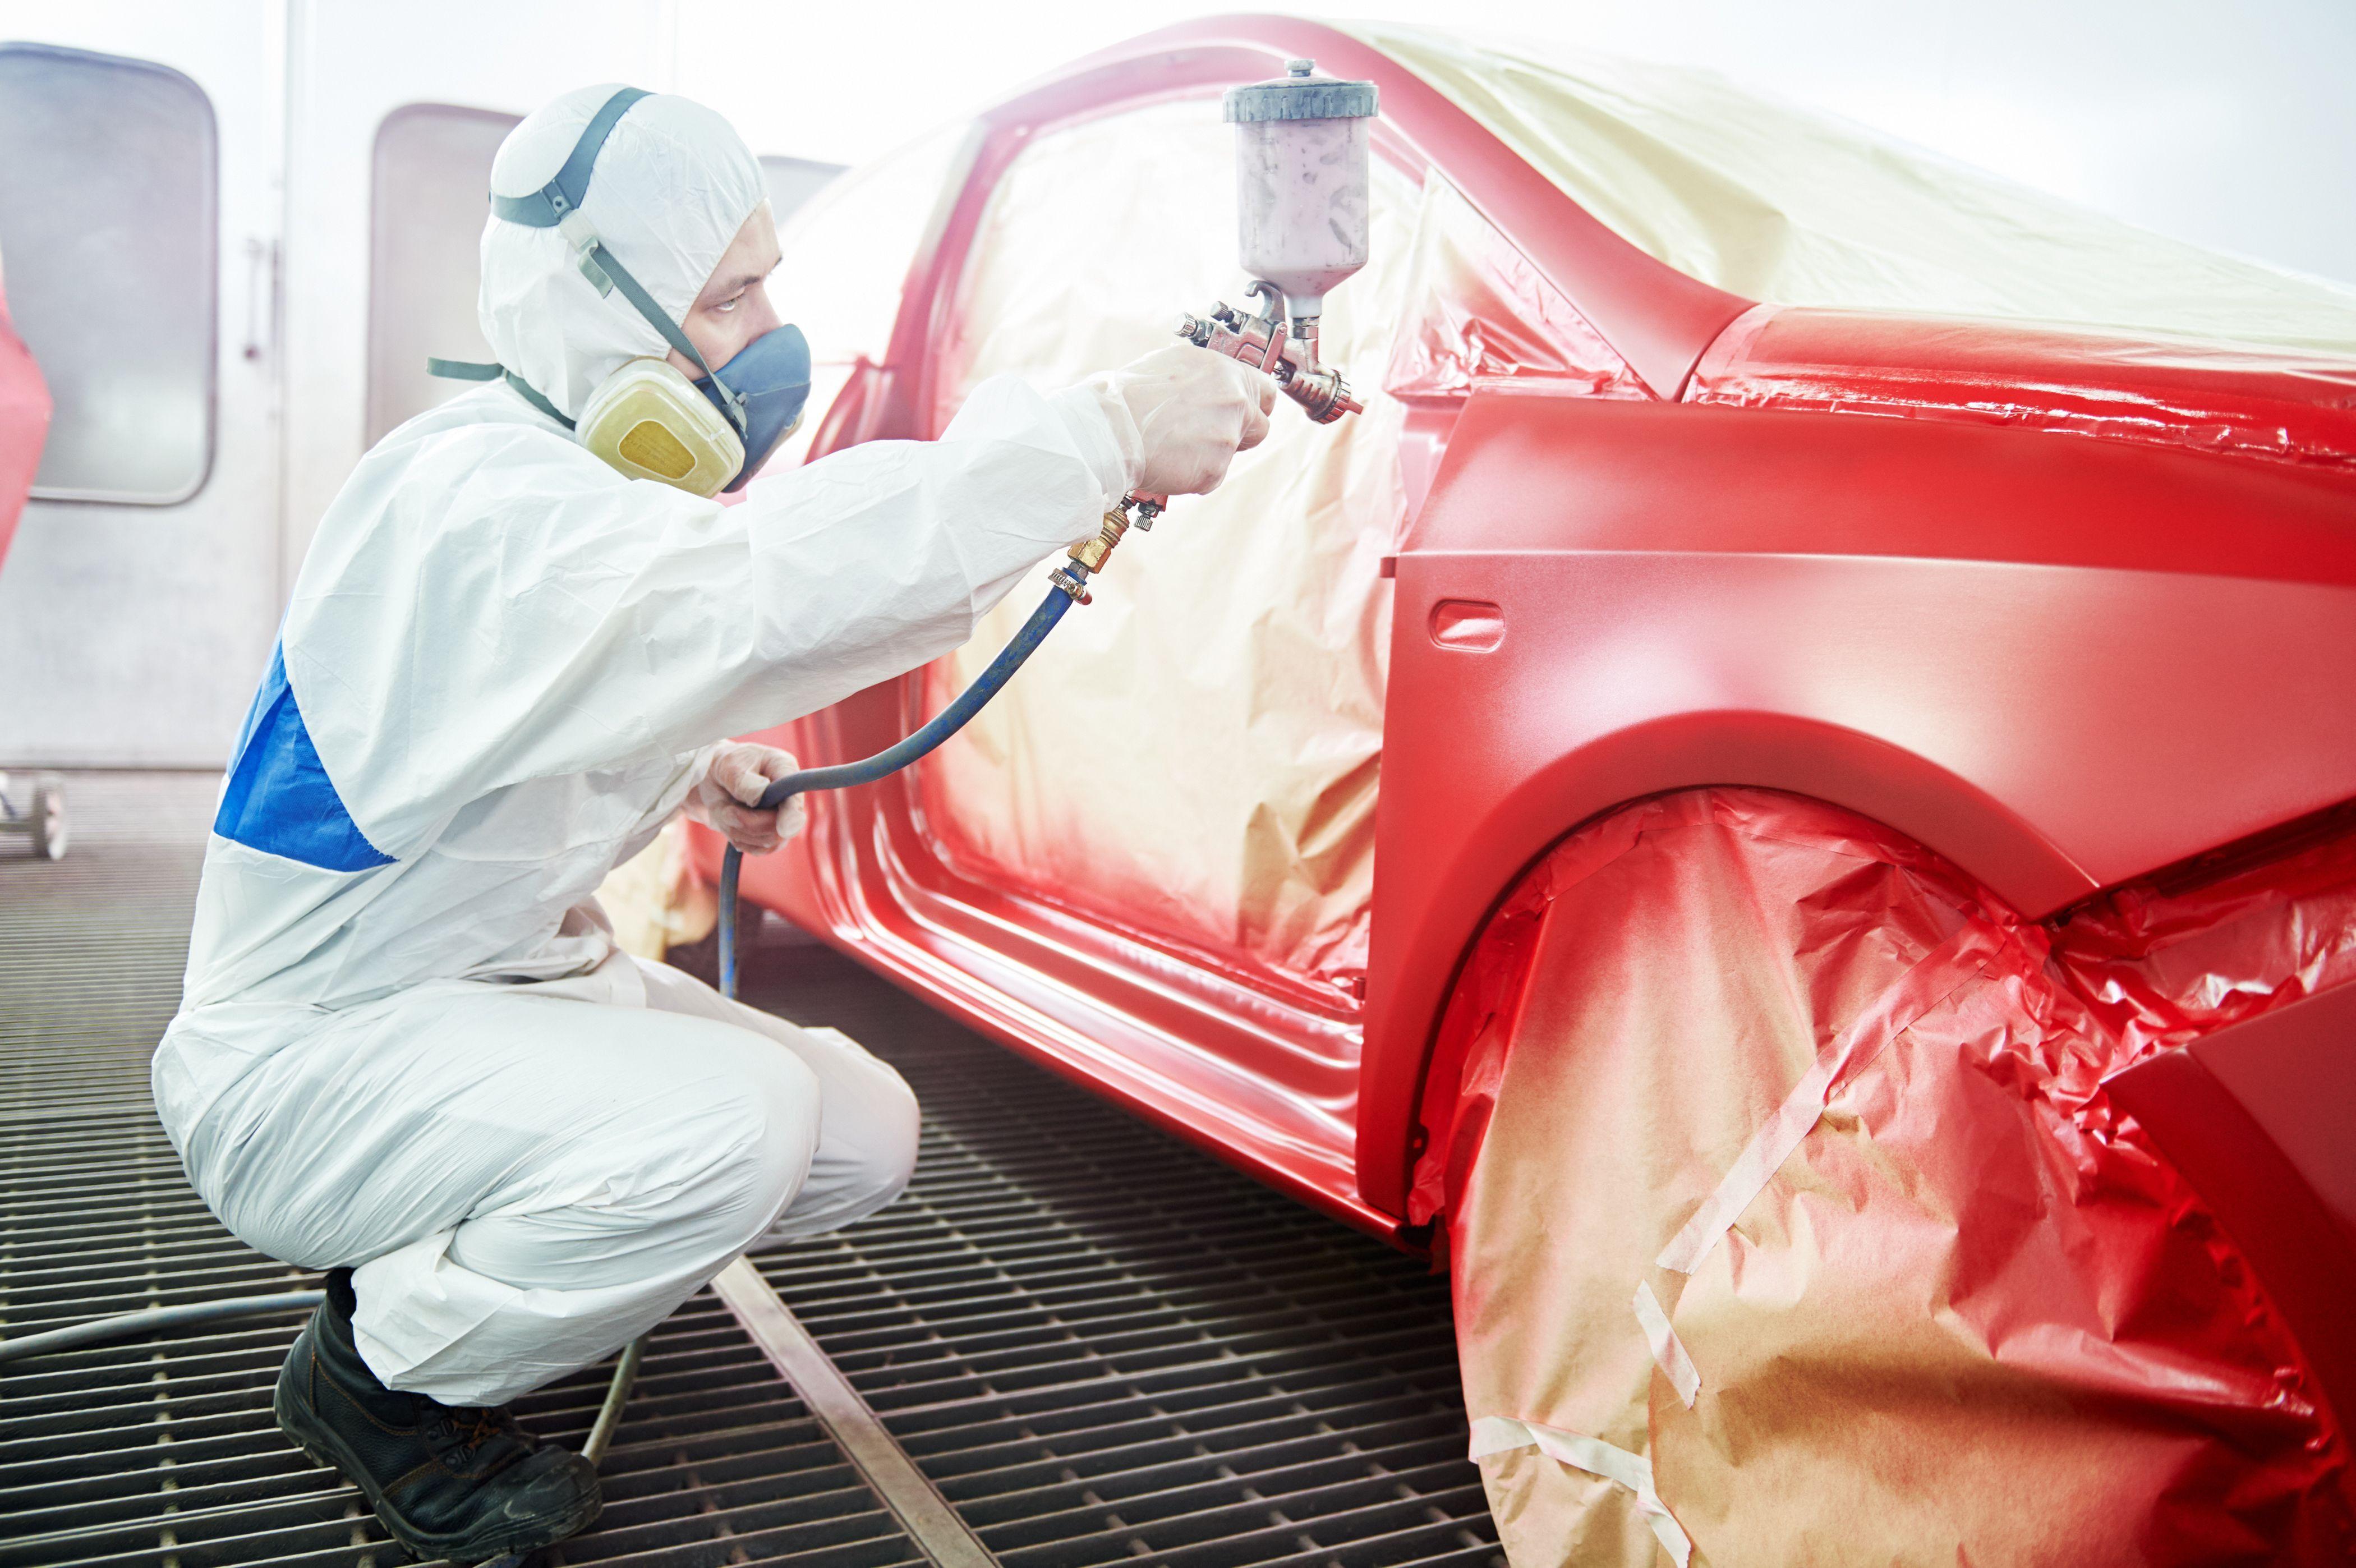 Painting Over Clear Coat On A Car En 2020 Seguro De Auto Autos Vehiculos